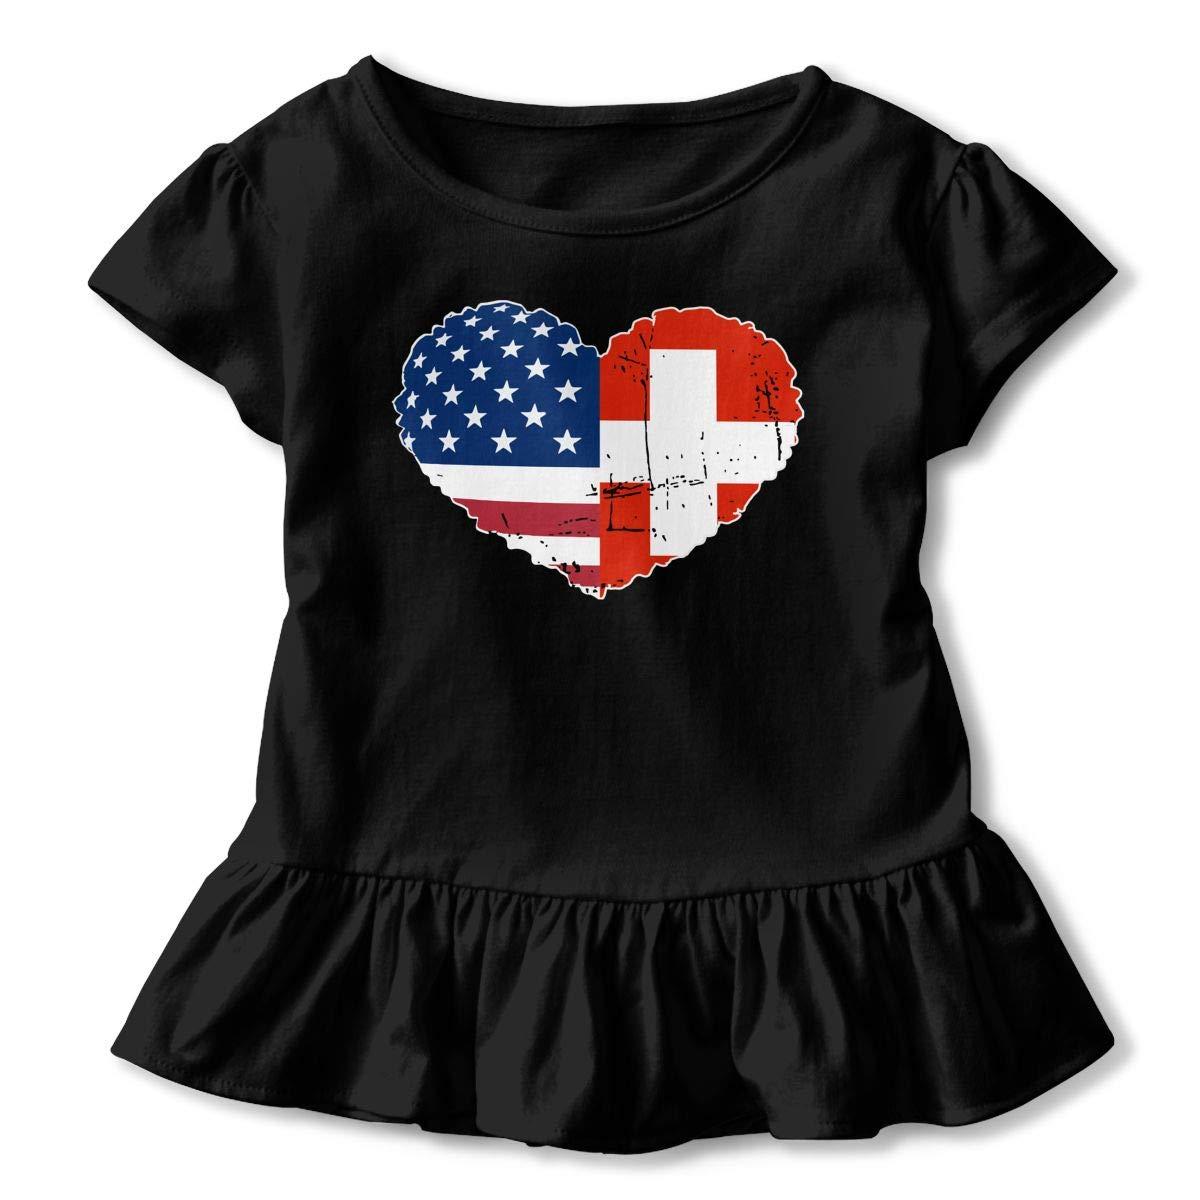 Kcloer24 Kids Switzerland USA Flag Heart Cute Short Sleeve Ruffles T-Shirt Summer Clothes for 2-6 Years Old